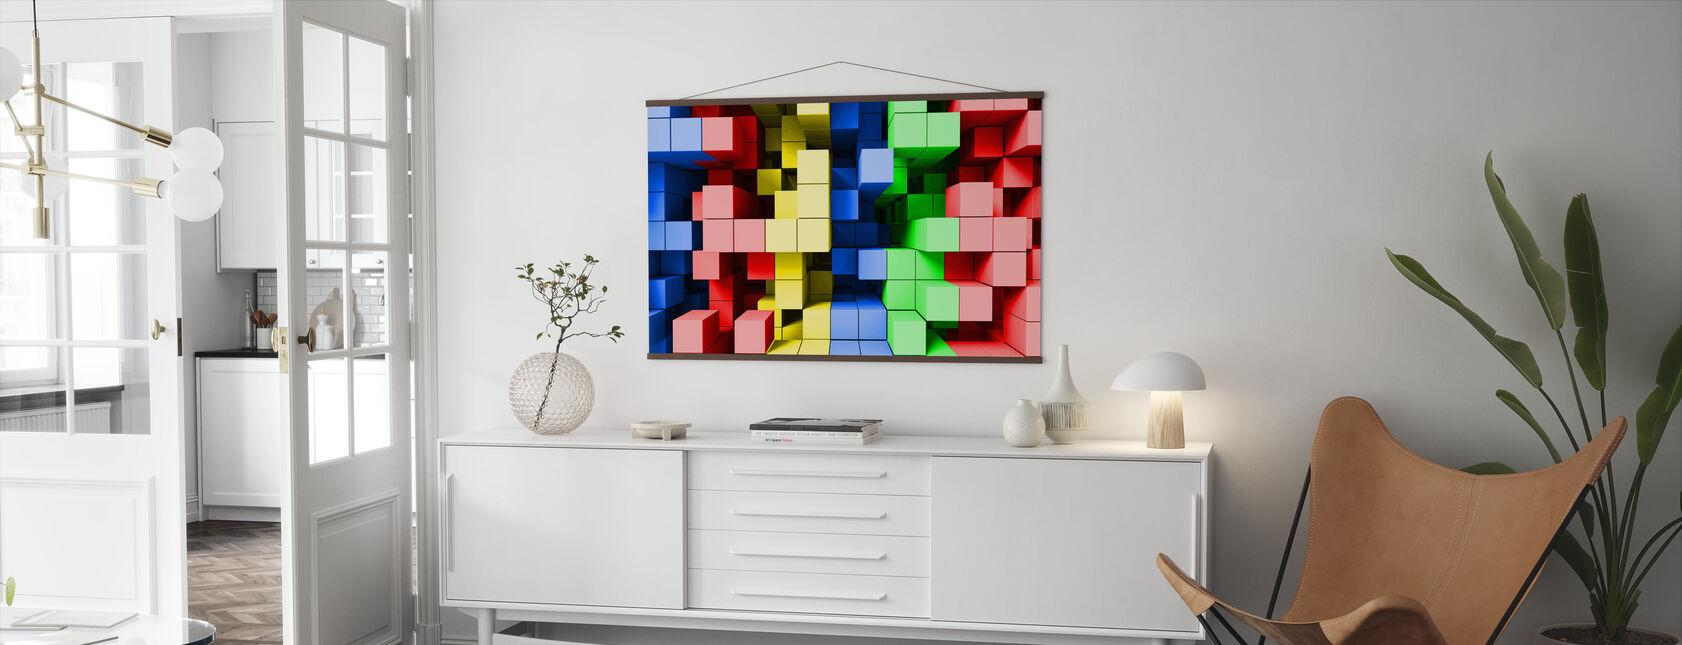 Djup Tetris färg - Poster - Vardagsrum